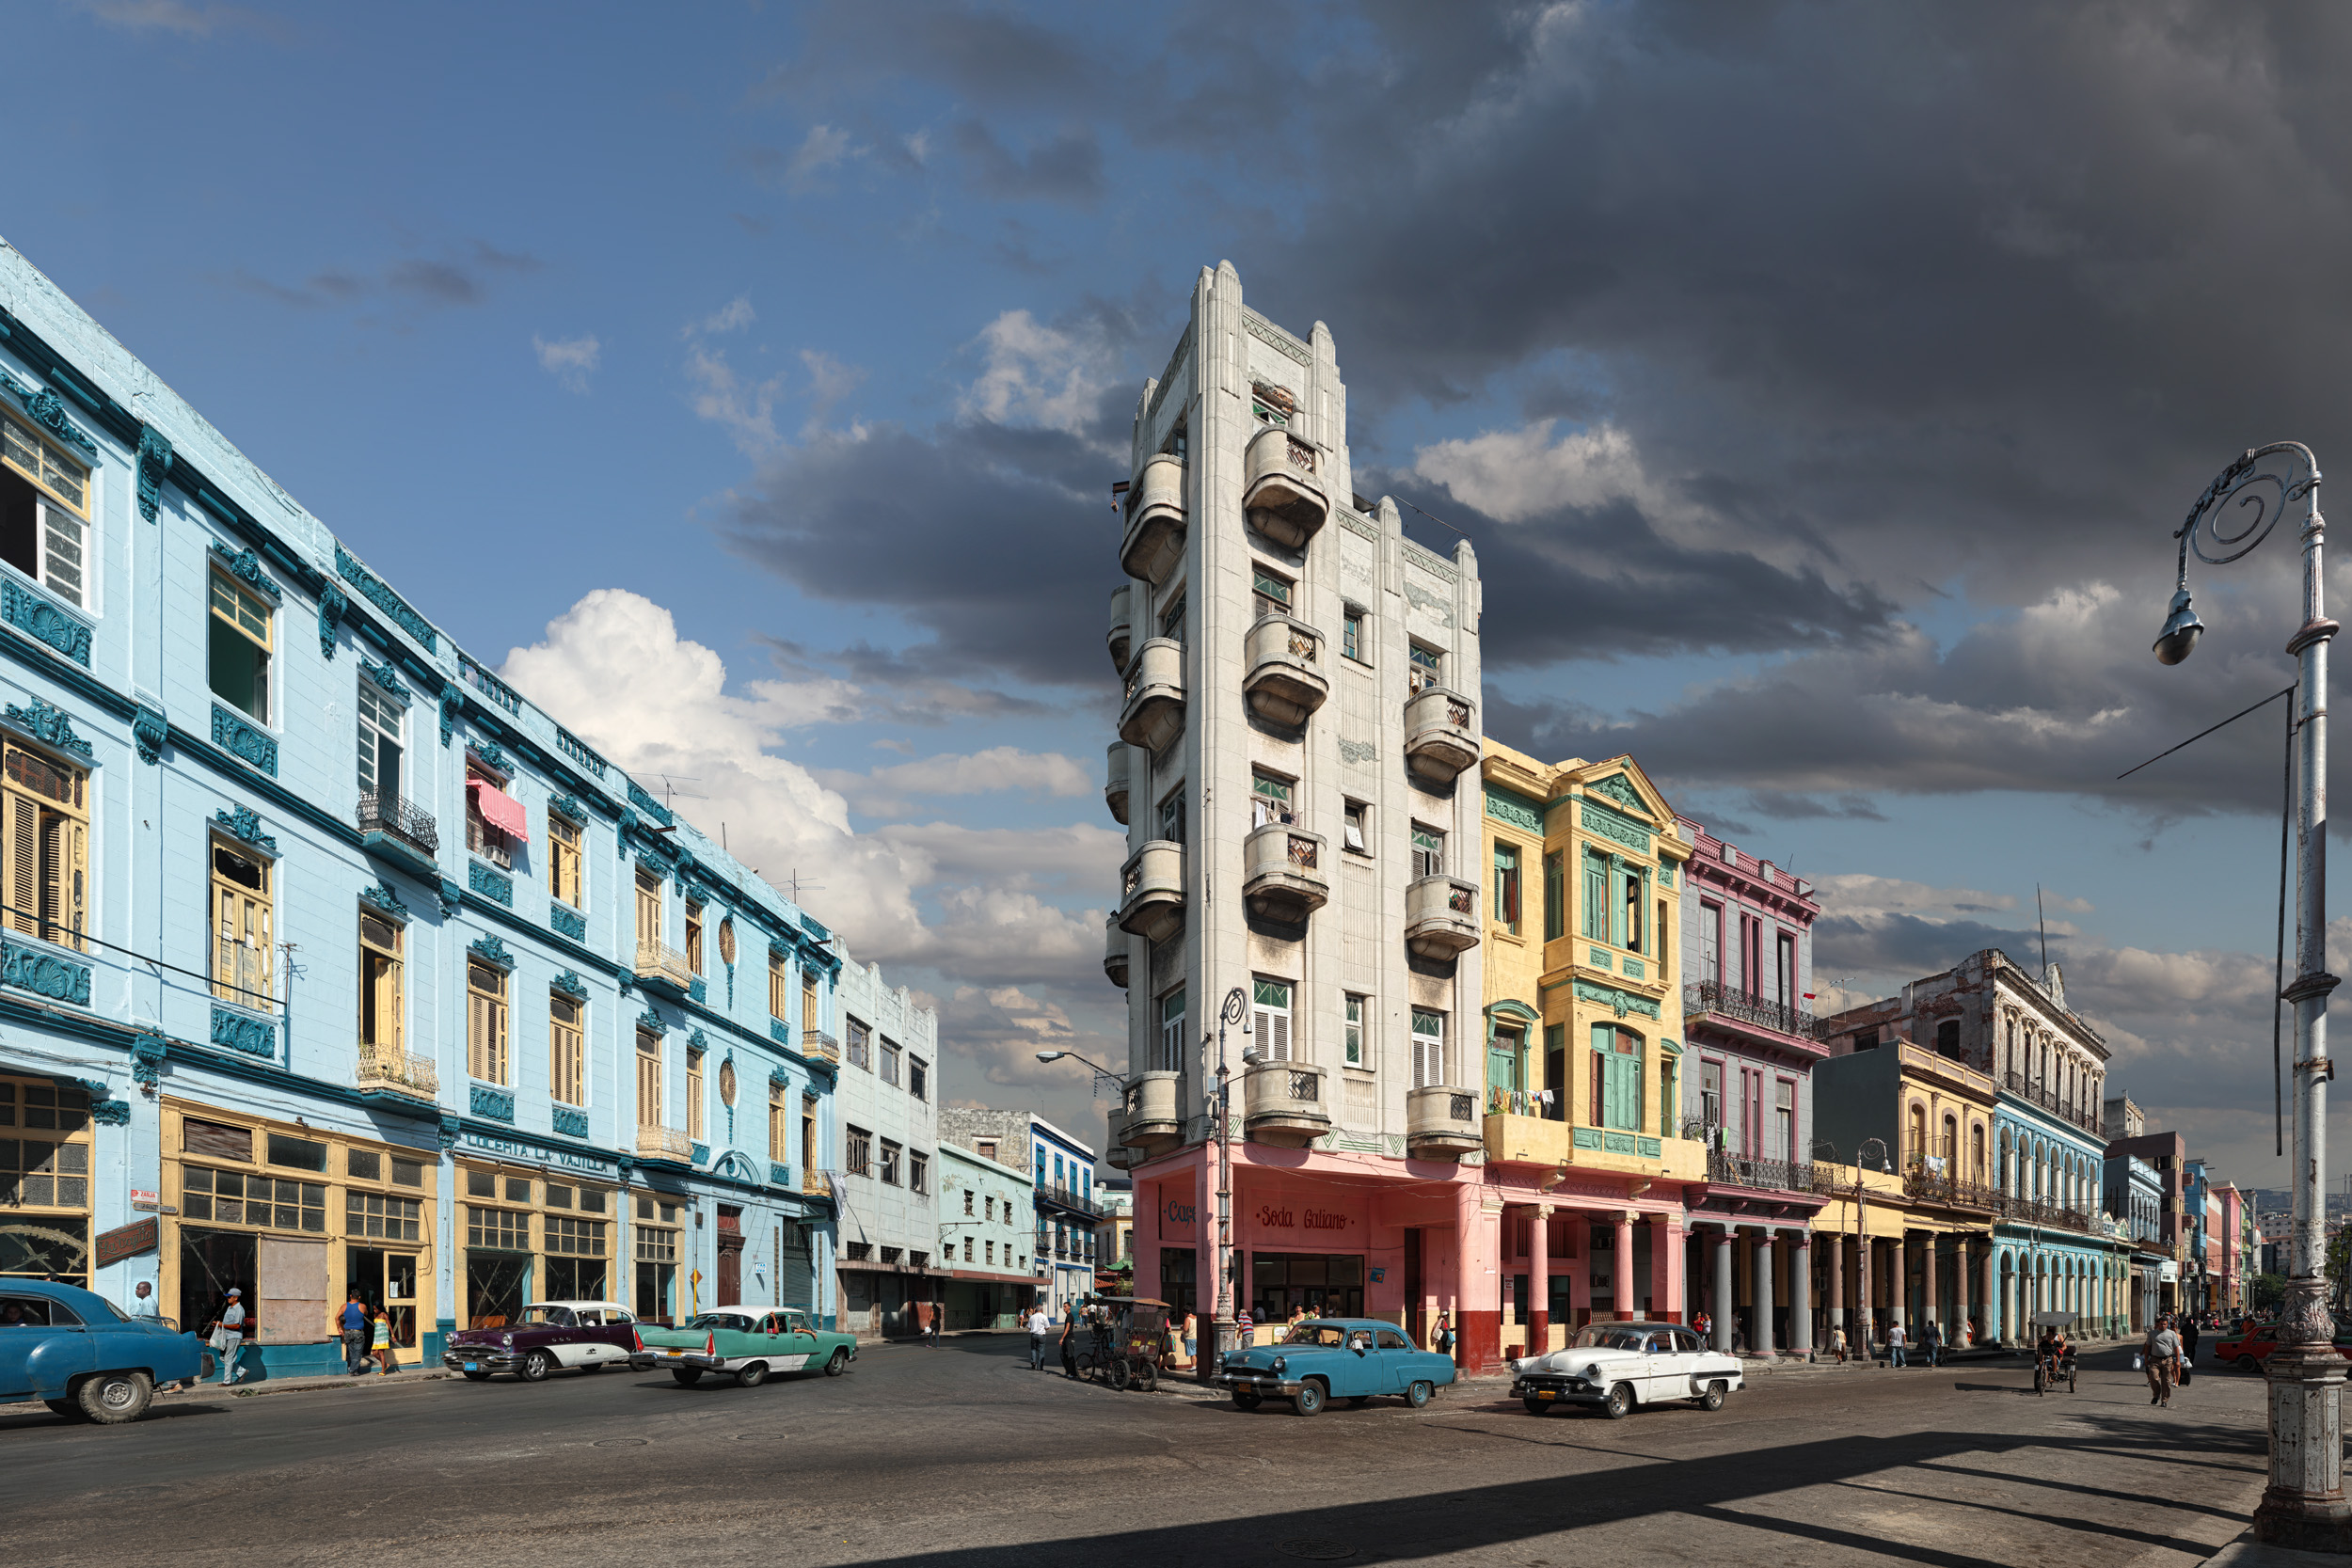 Avenida de Italia - Havana, Cuba 2010